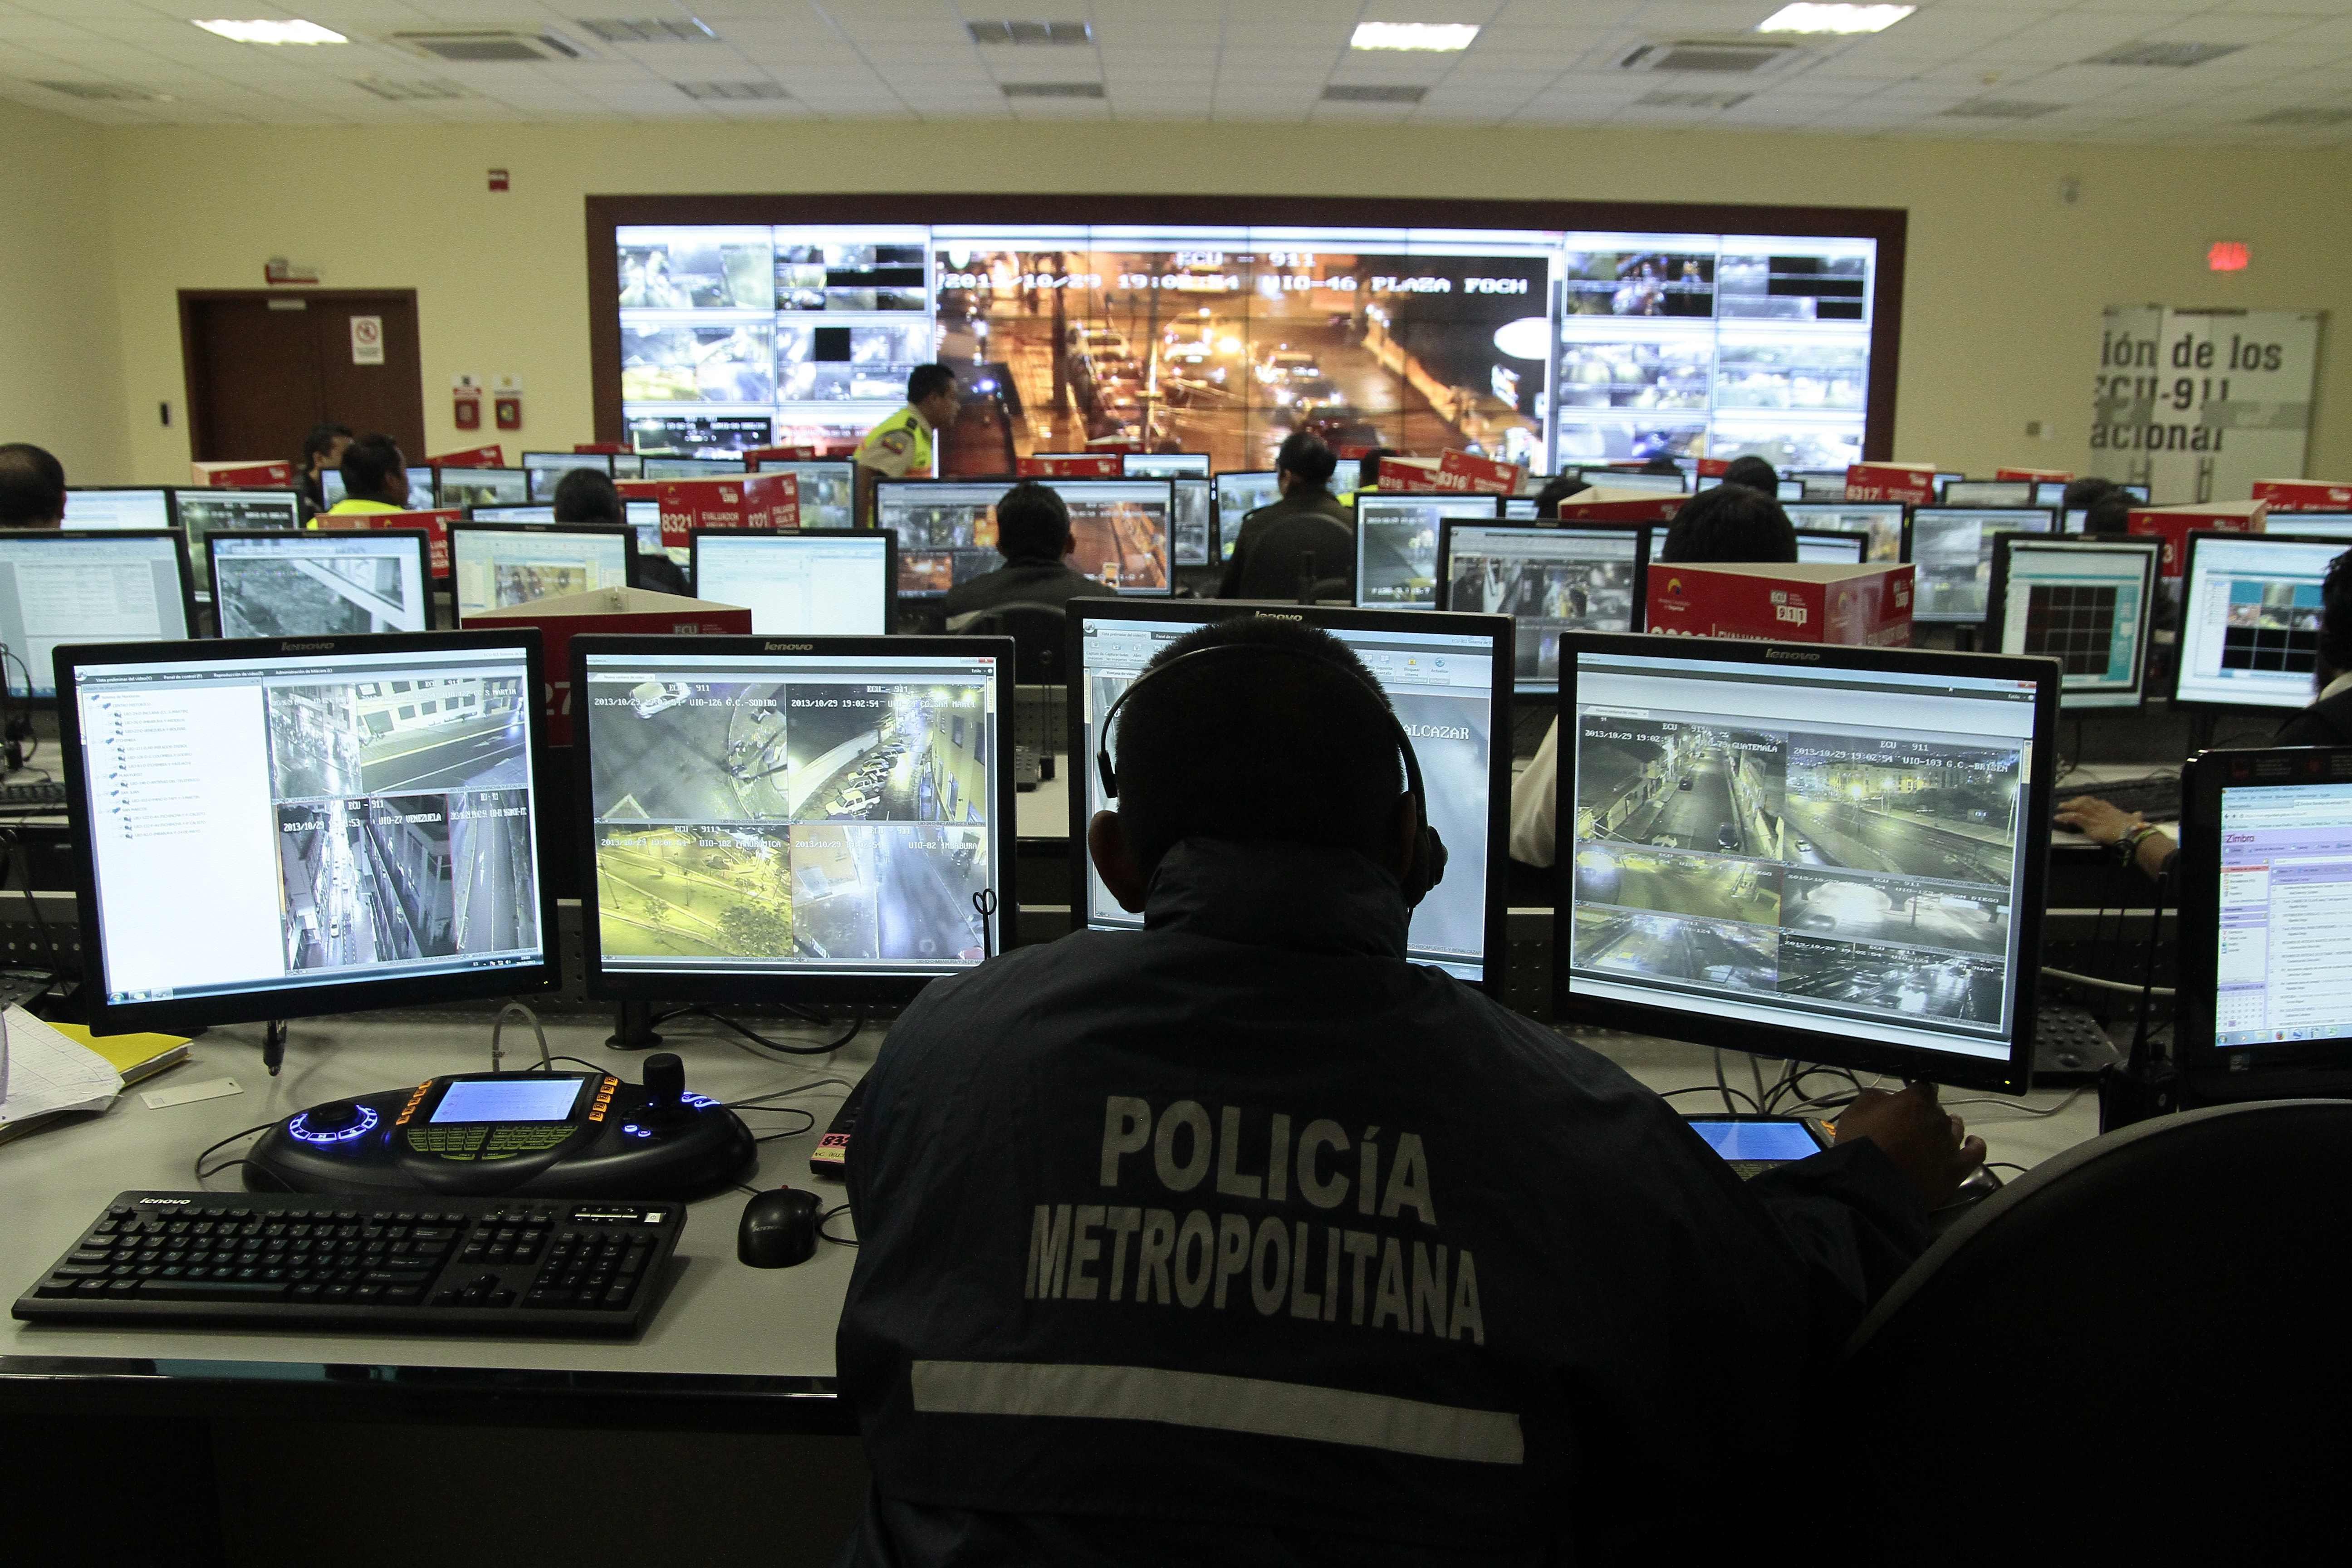 Ecuador is fighting crime using Chinese surveillance